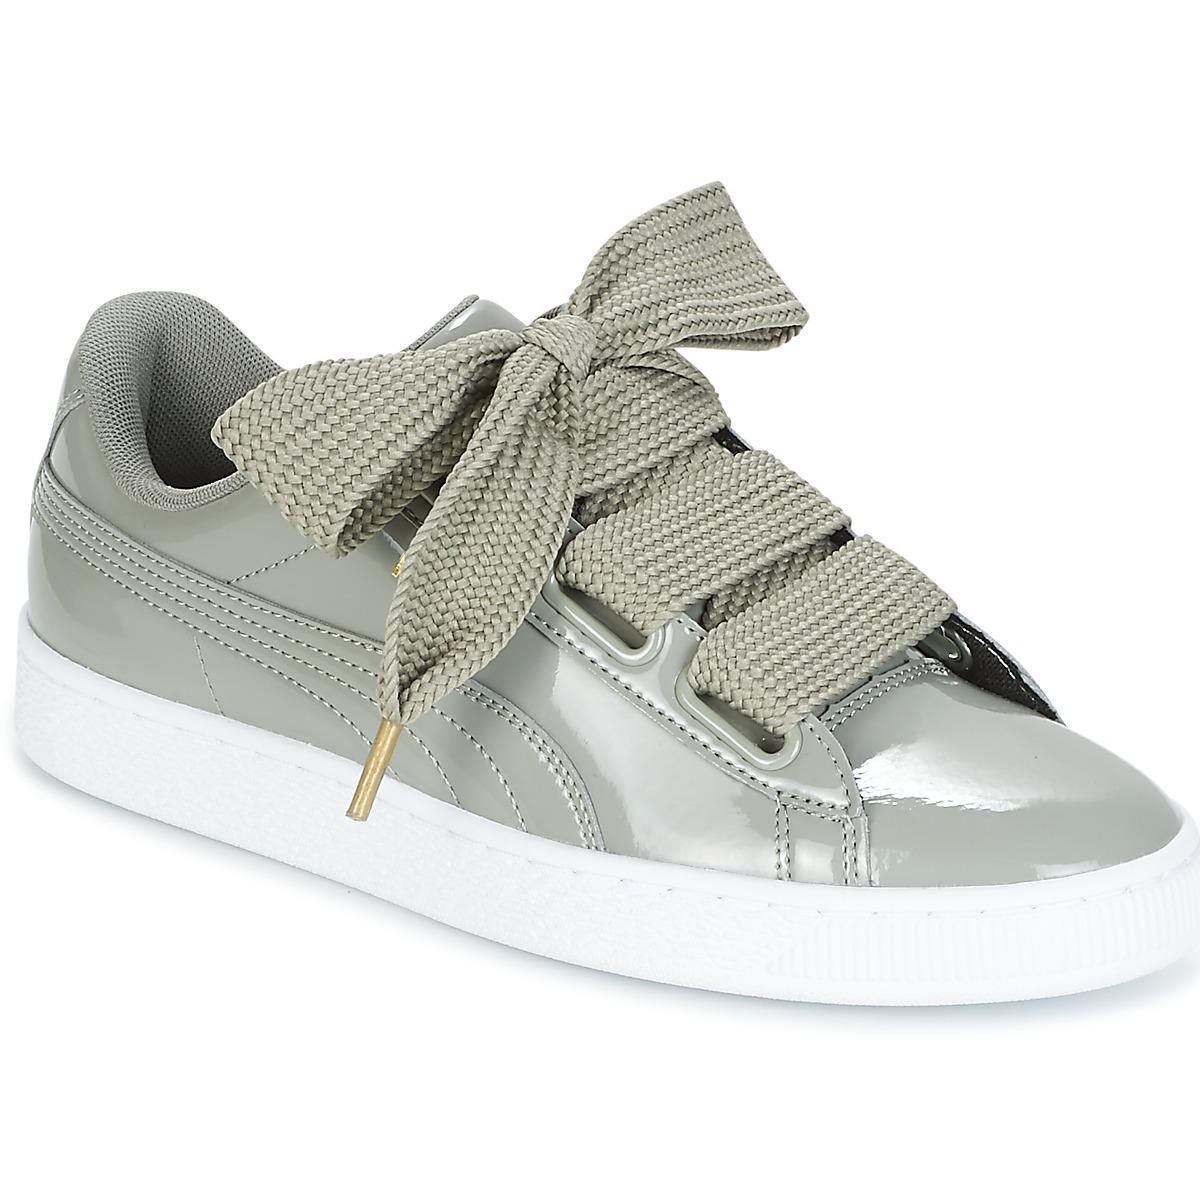 adidas originals stan smith baskets basses white black baskets femme zalando. Black Bedroom Furniture Sets. Home Design Ideas